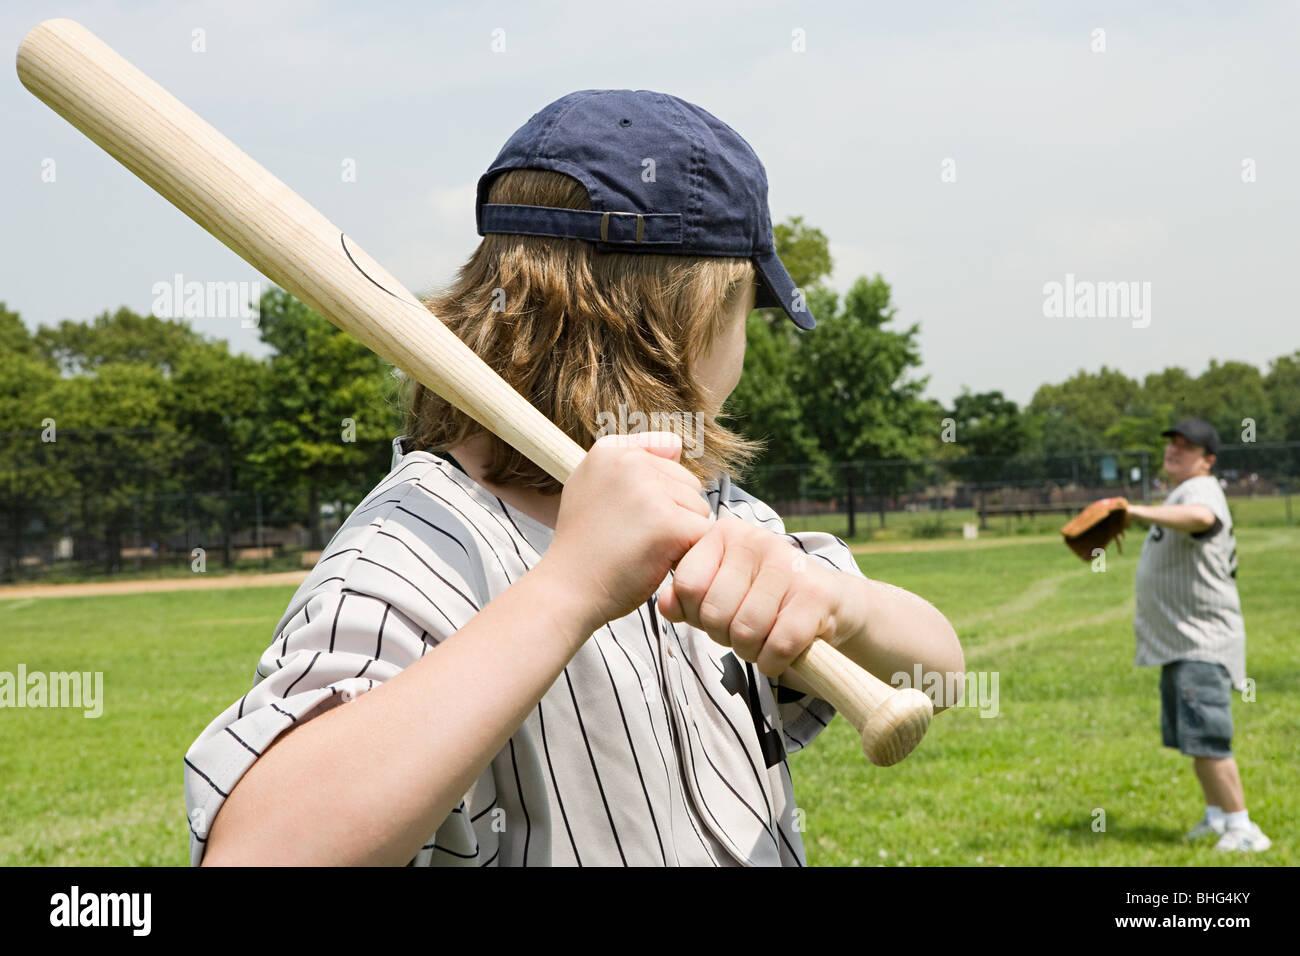 Father and son playing baseball - Stock Image